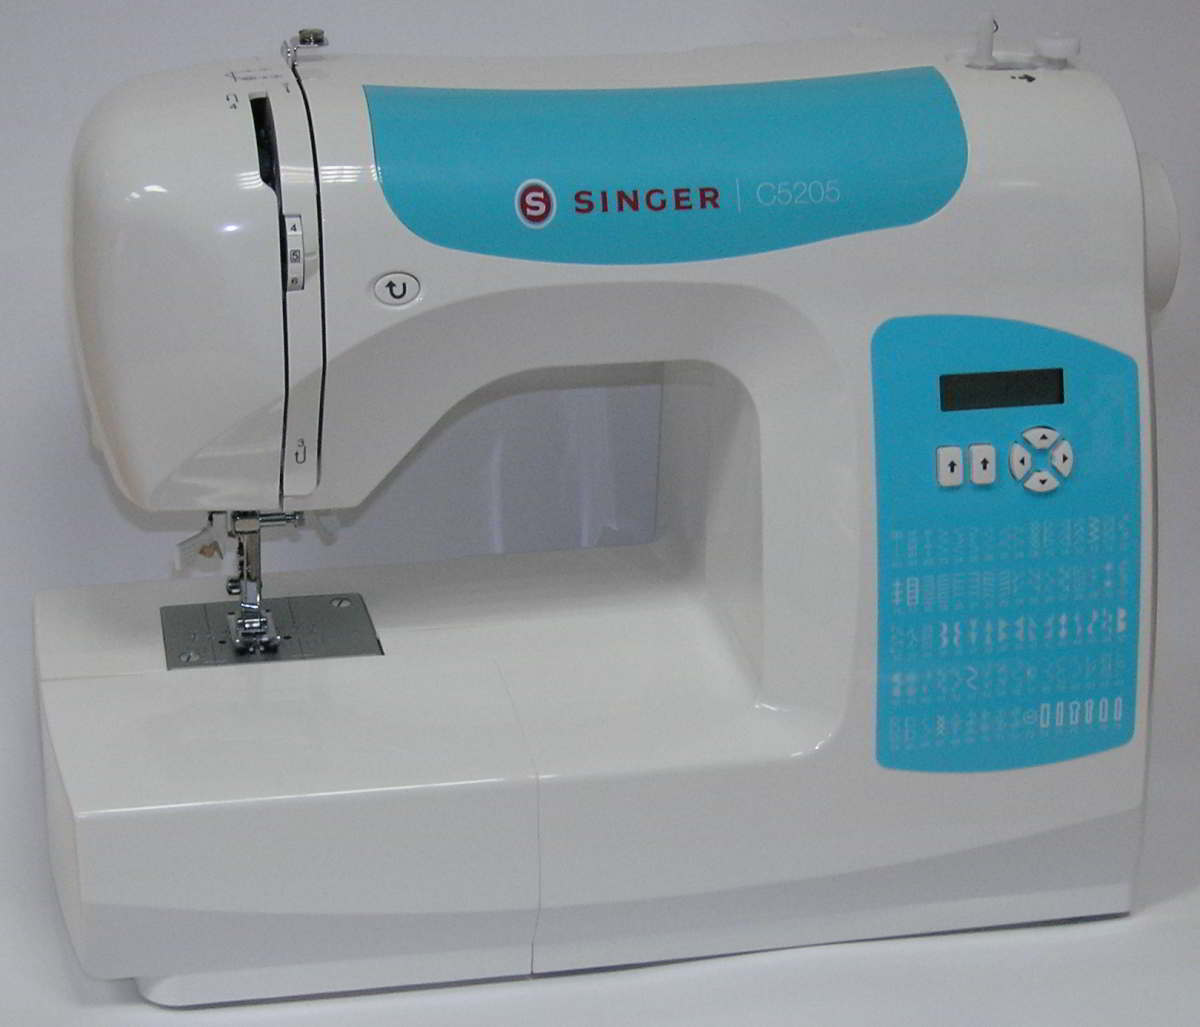 Singer C5205